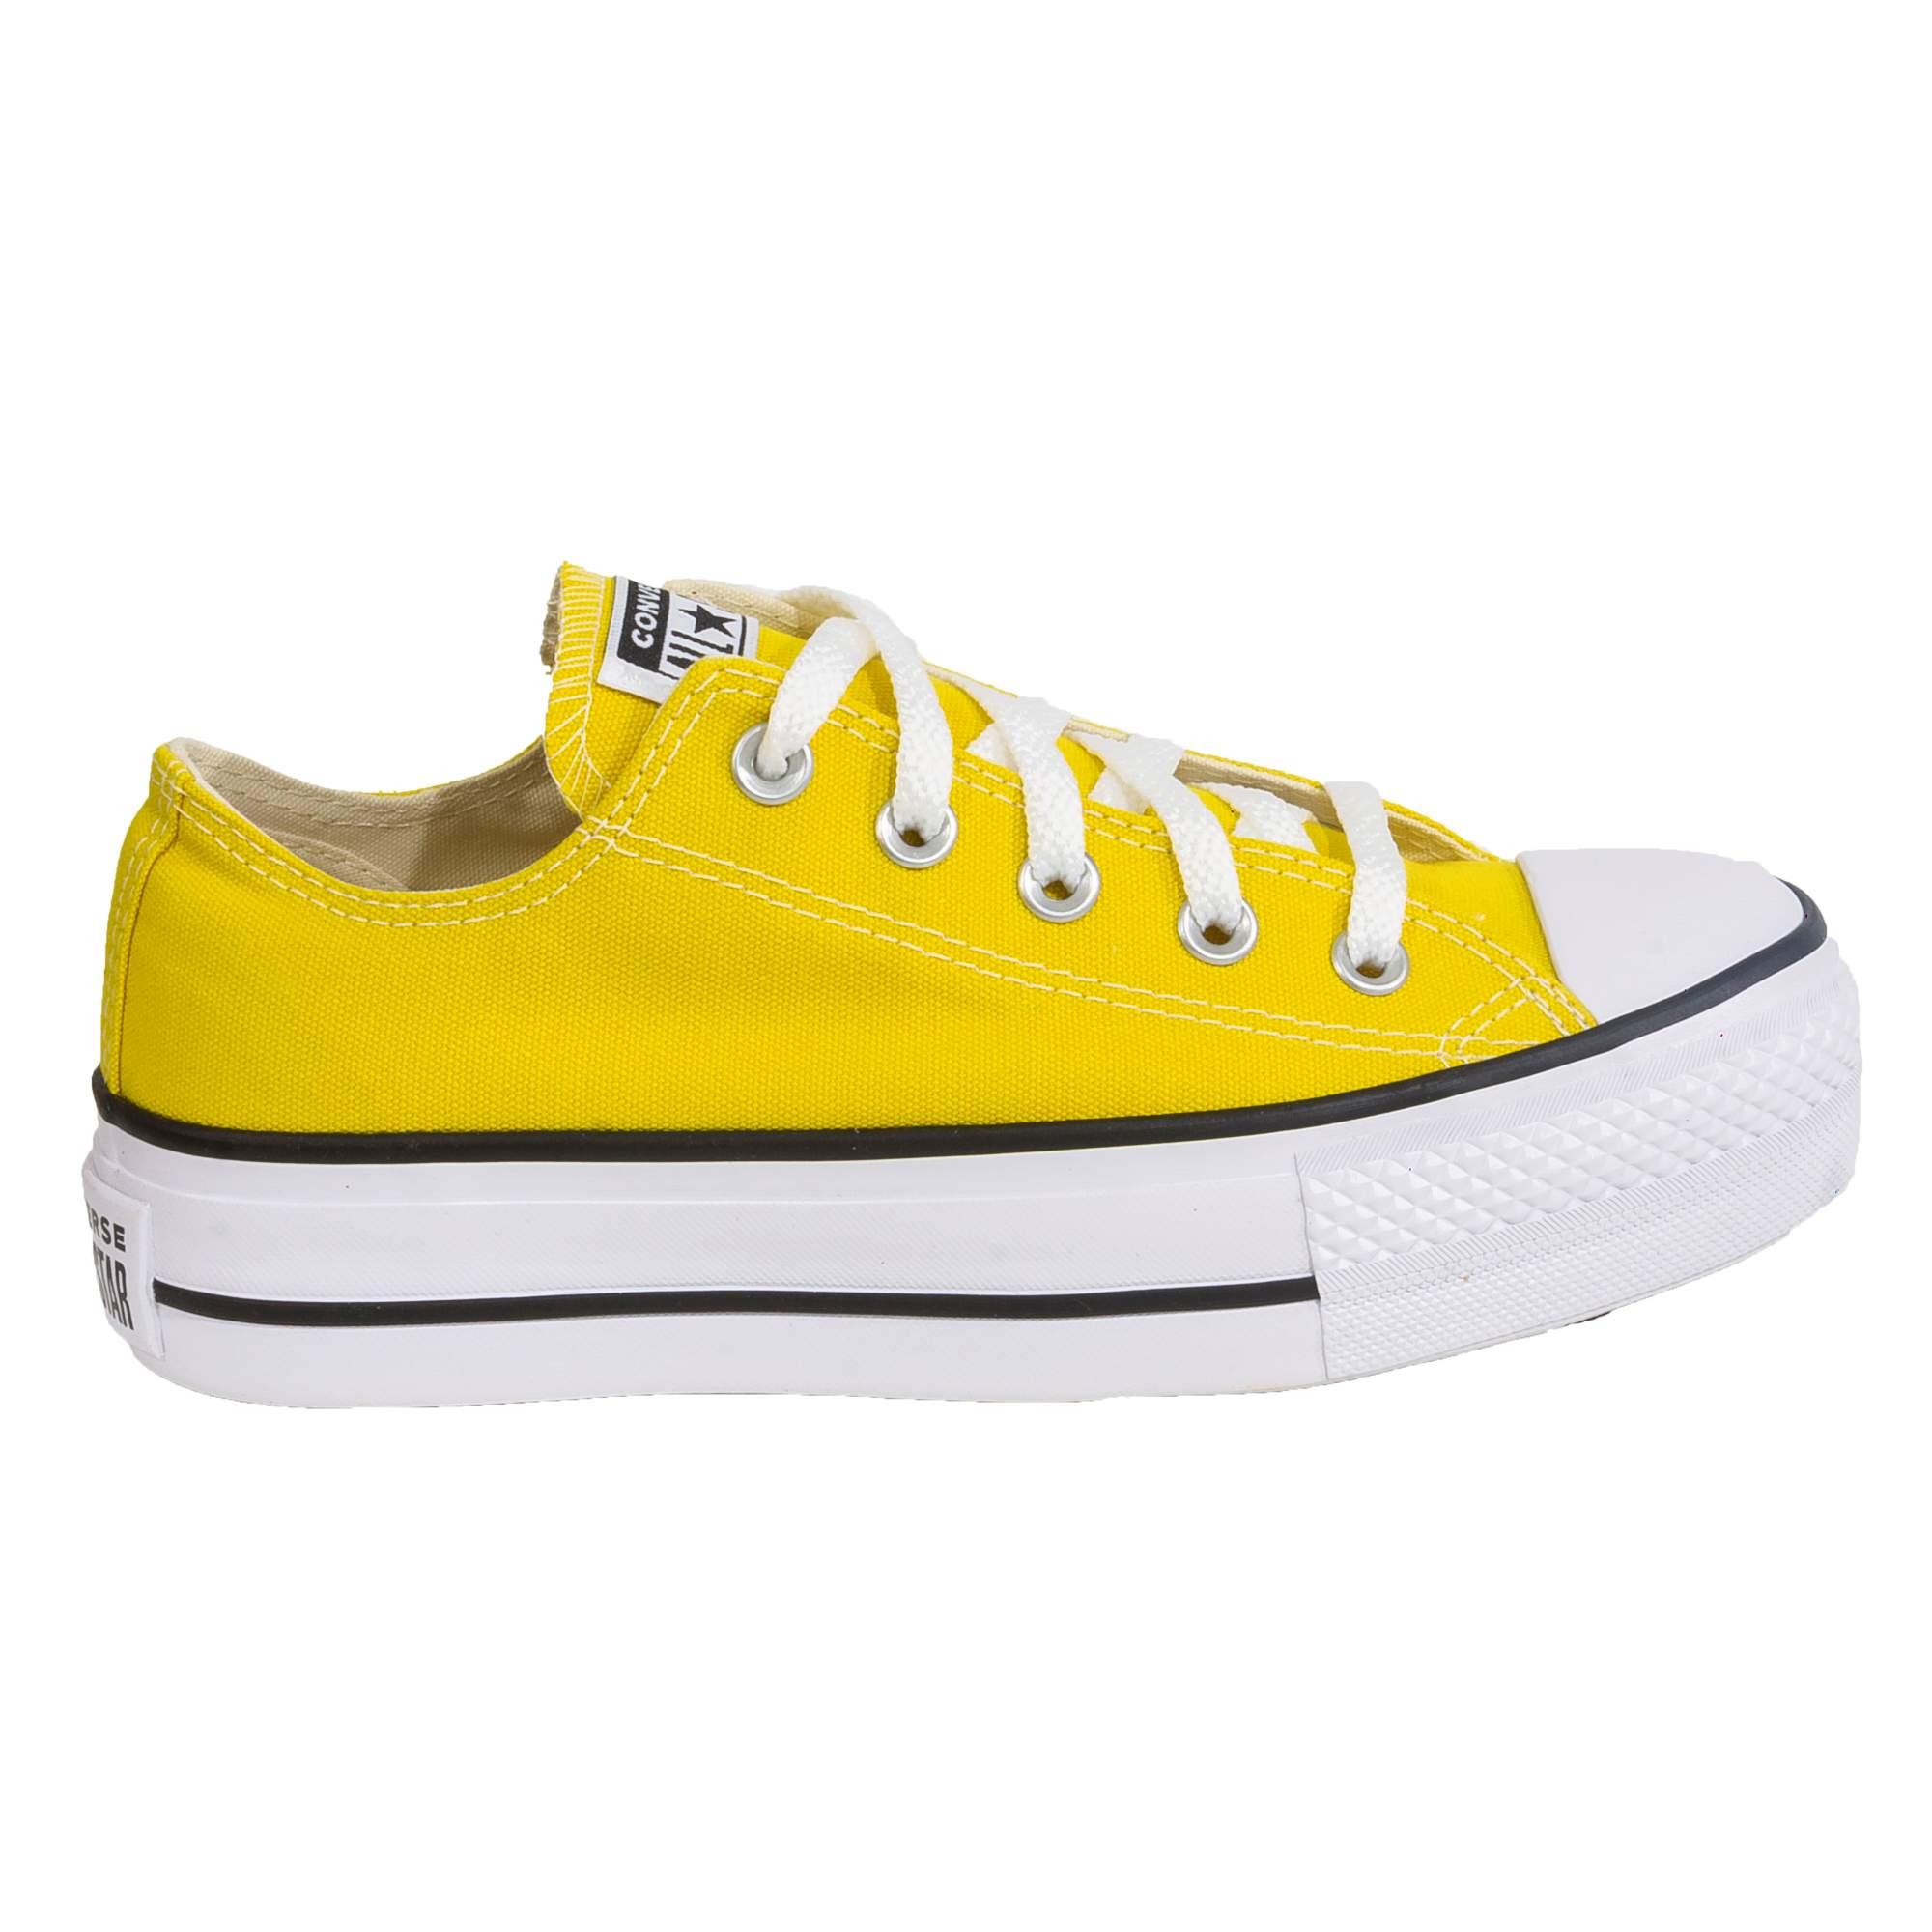 Tênis Converse All Star Chuck Taylor Plataforma Amarelo